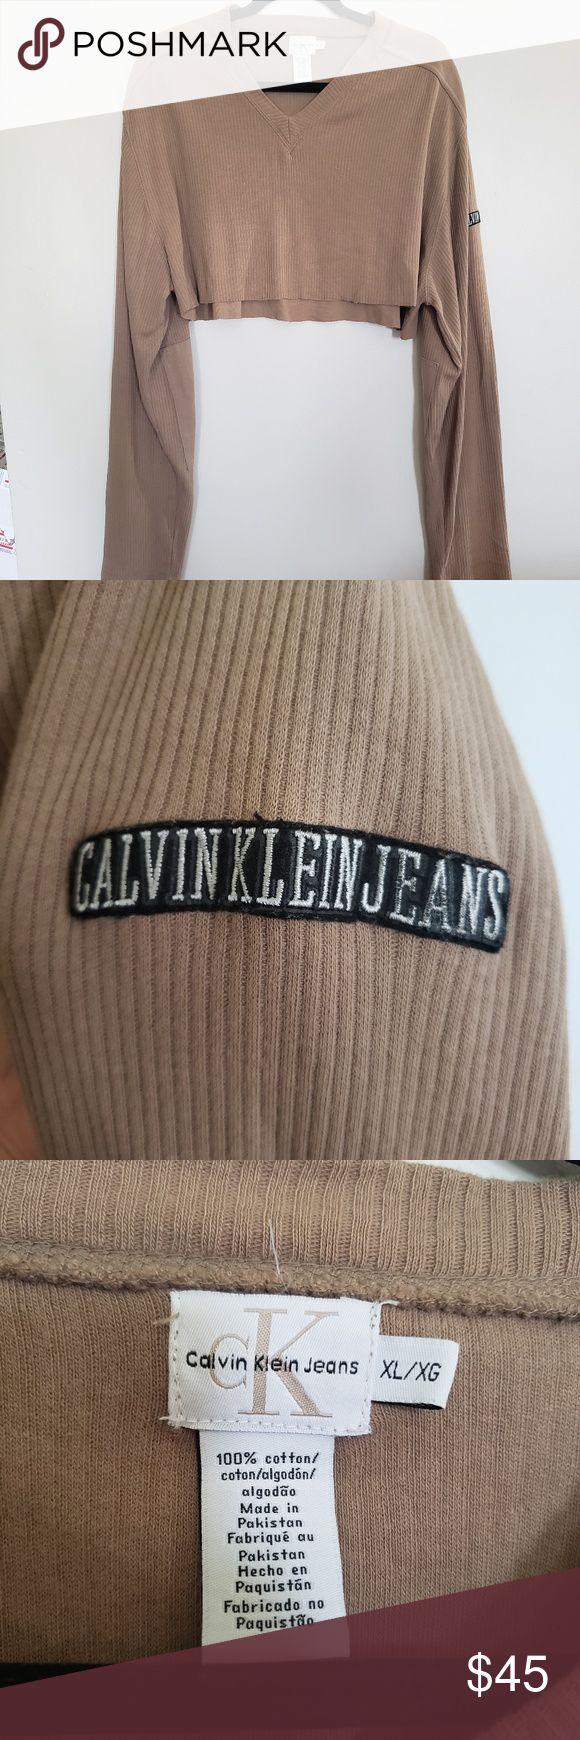 Vintage // Calvin Klein long sleeve v-neck crop S i z e R e f e r e n c e -Model: 5 quot;2 D e t a i l s -Self cropped (raw hem) -Condition: Great! Vt...